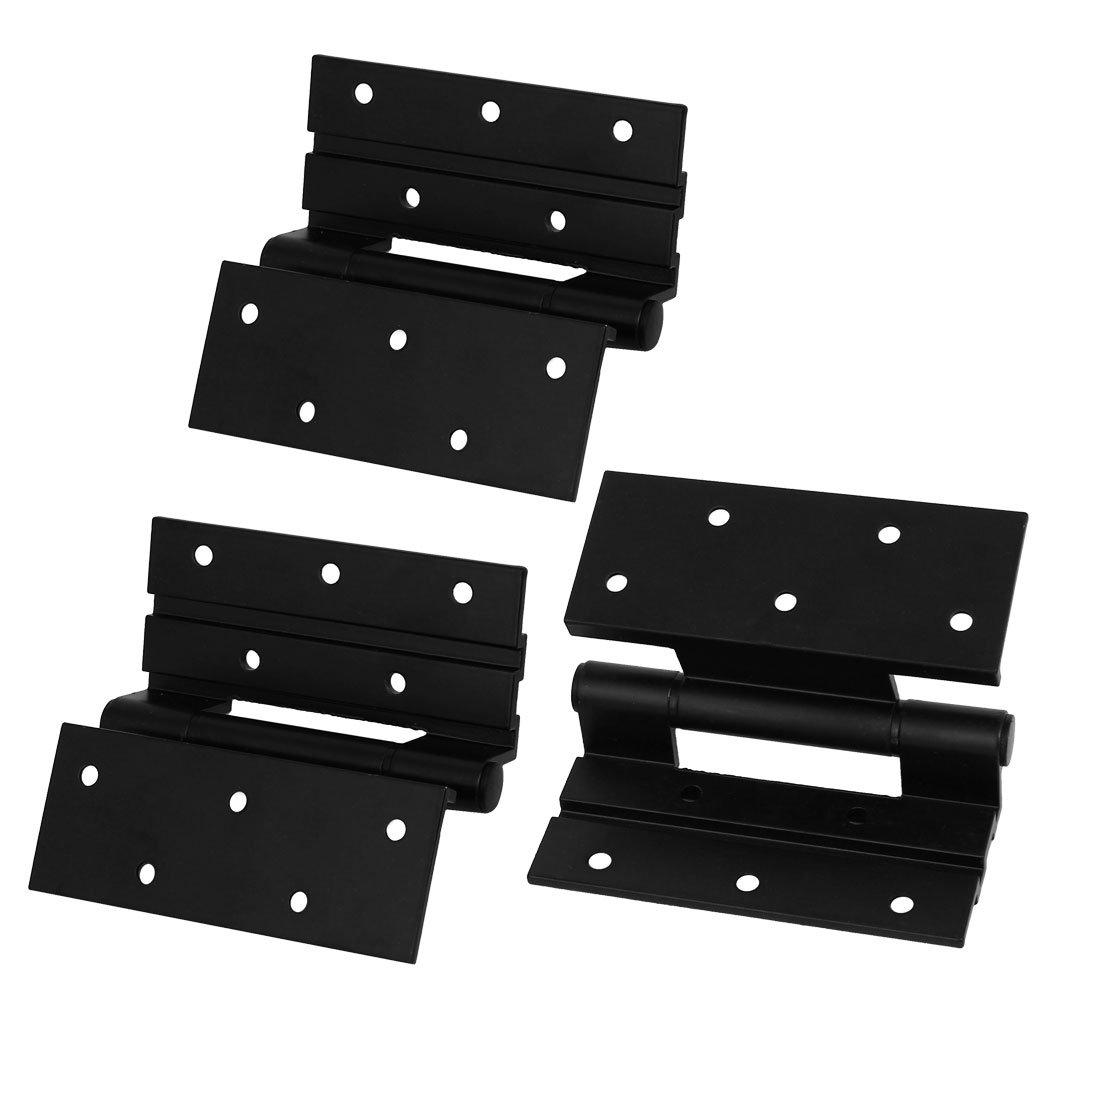 uxcell Window Door 4-inch Long Aluminum Alloy Screw Fixed Stormproof Butt Hinge Black 3pcs